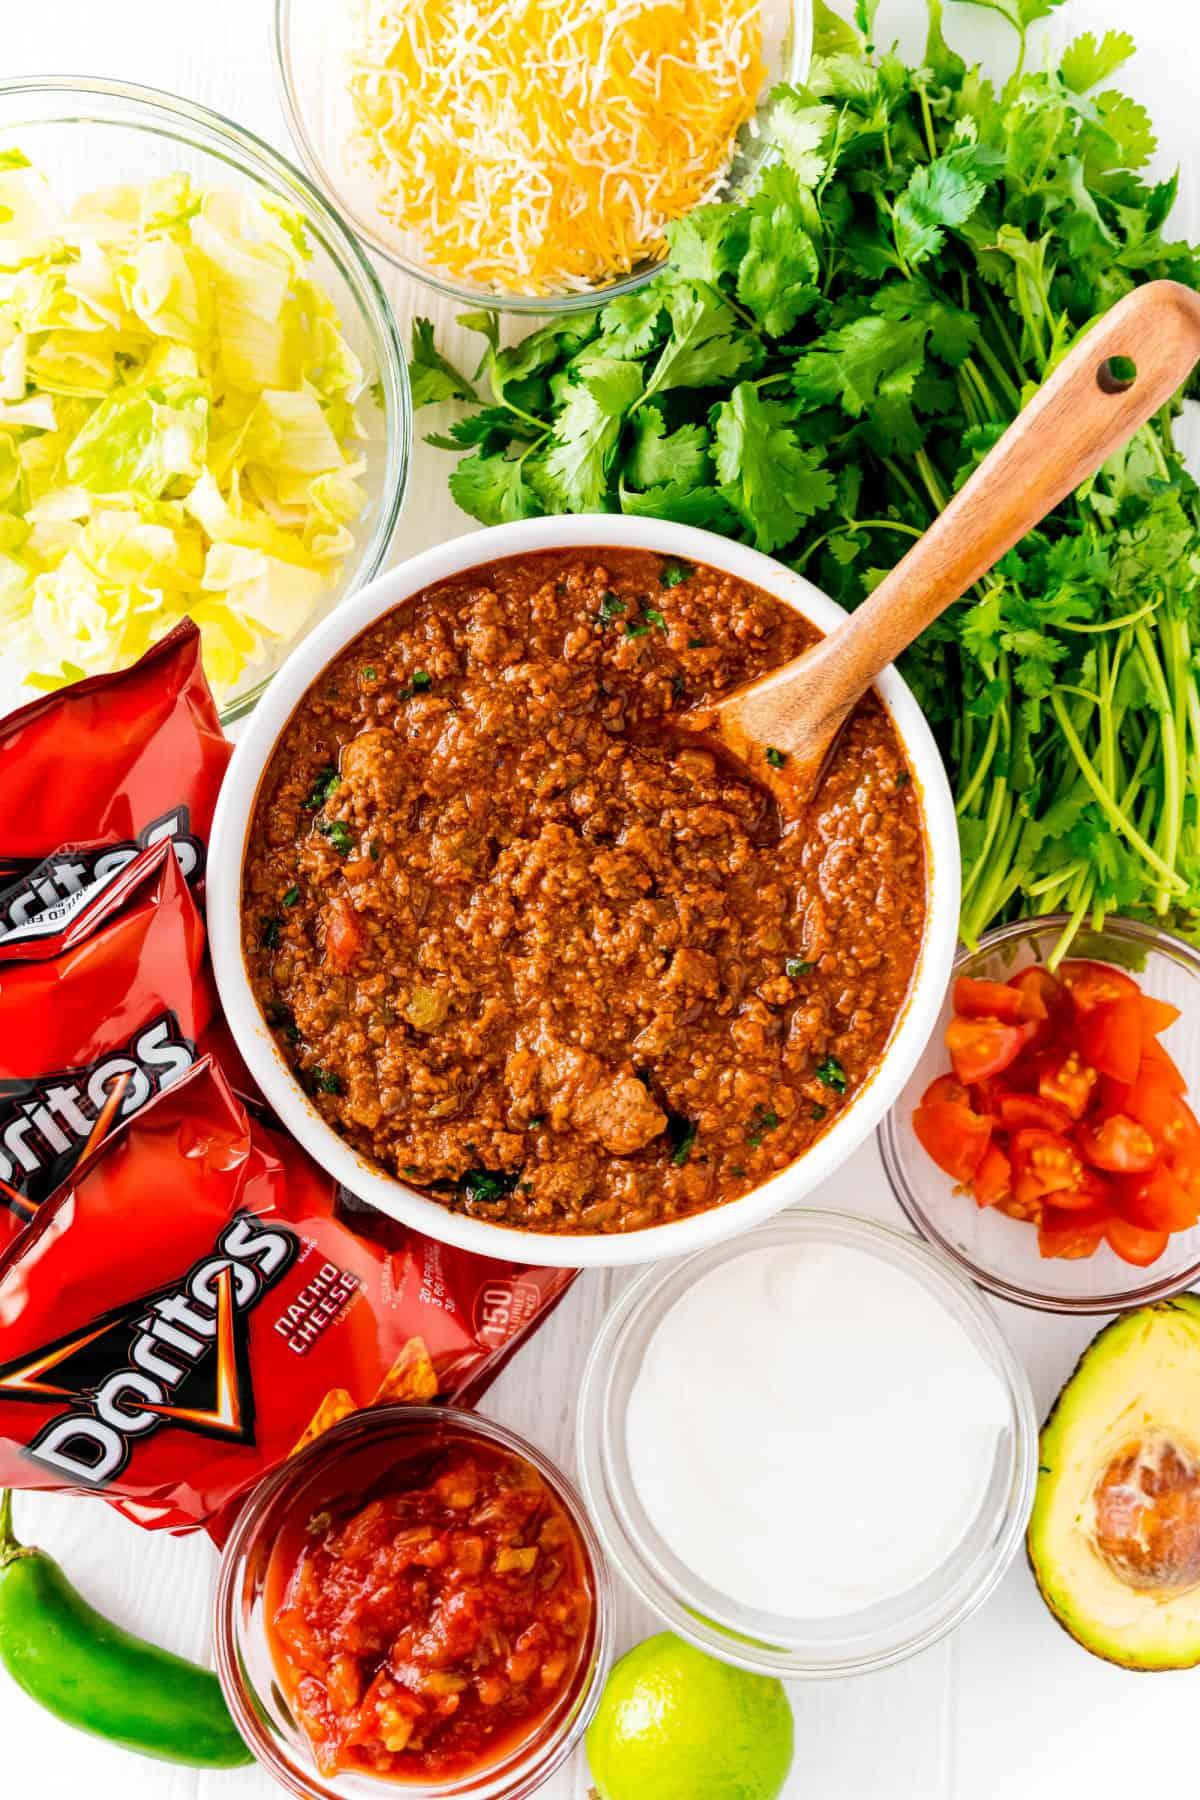 Ingredients needed for walking tacos.